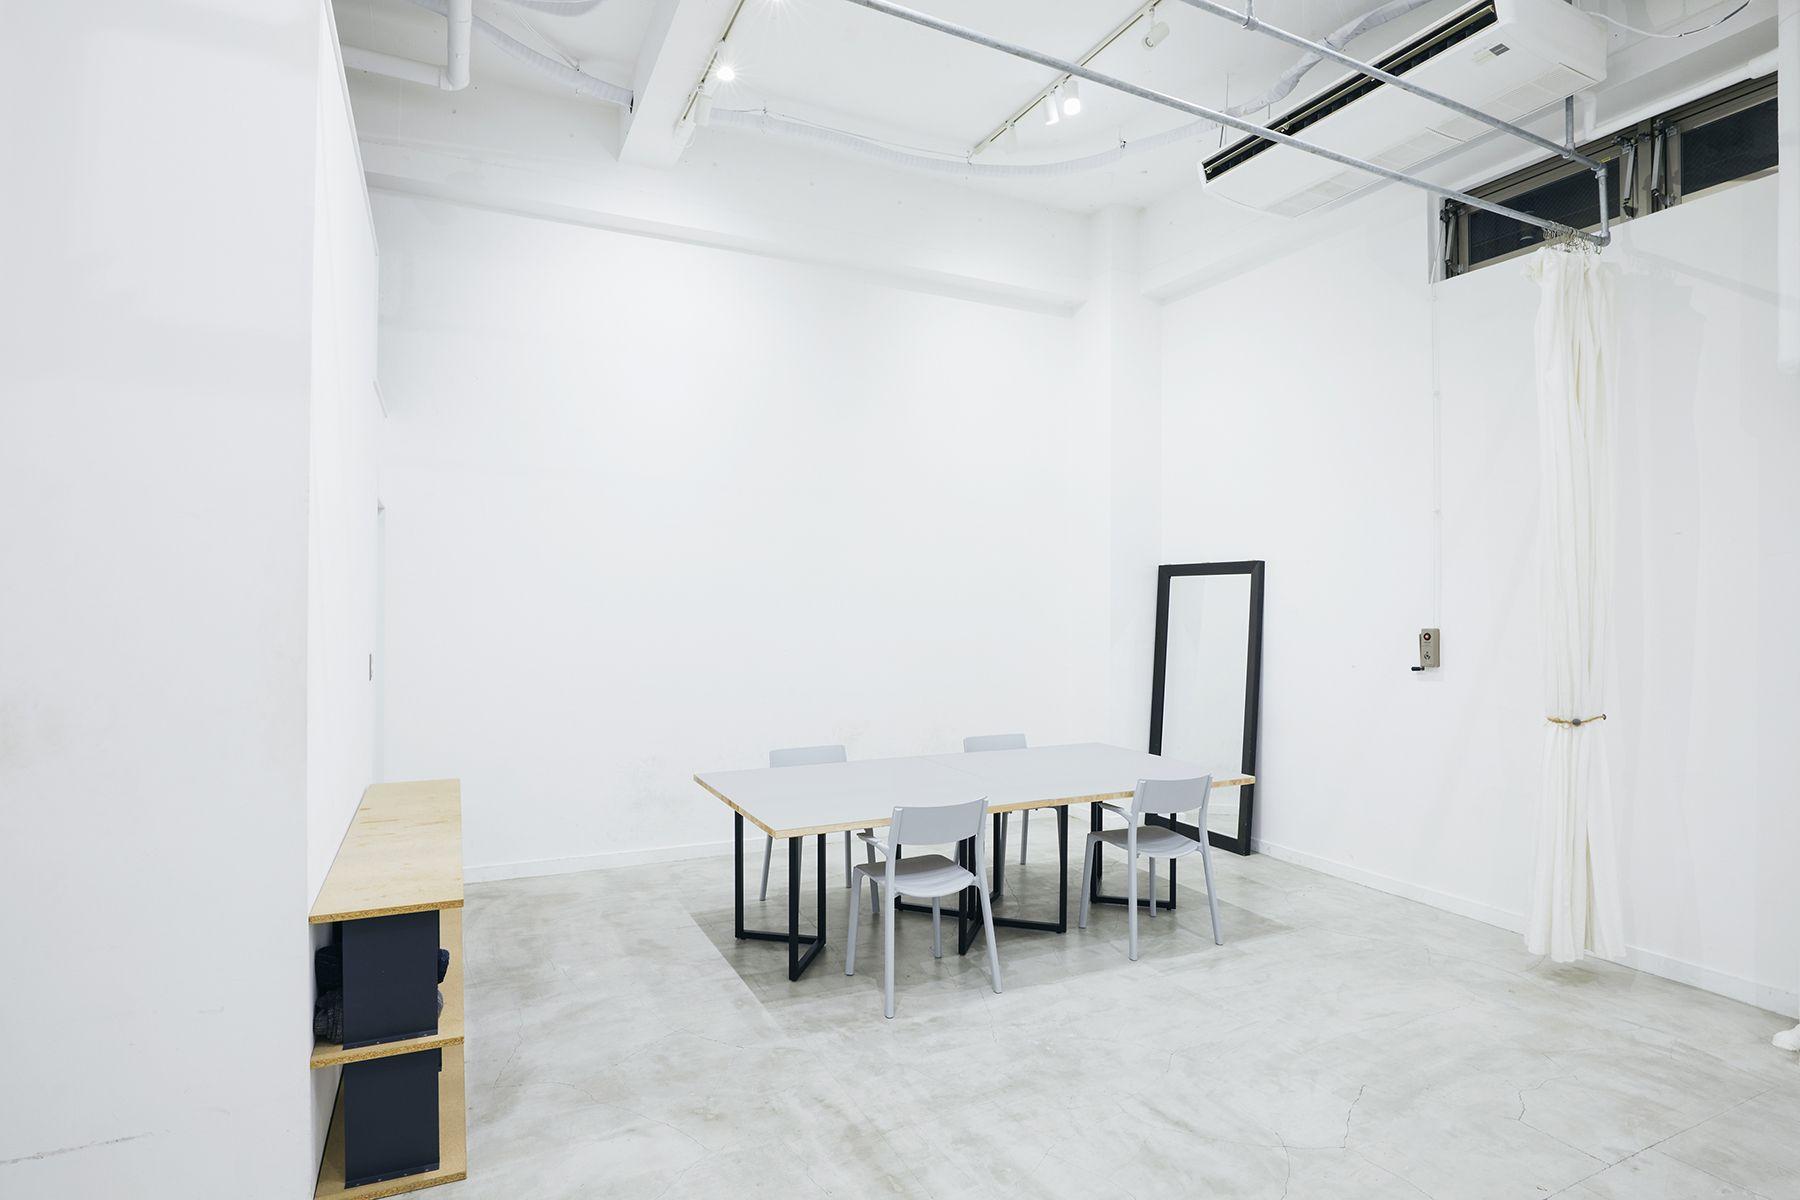 sinca studio 中野坂上 (シンカ スタジオ)待合スペースあります